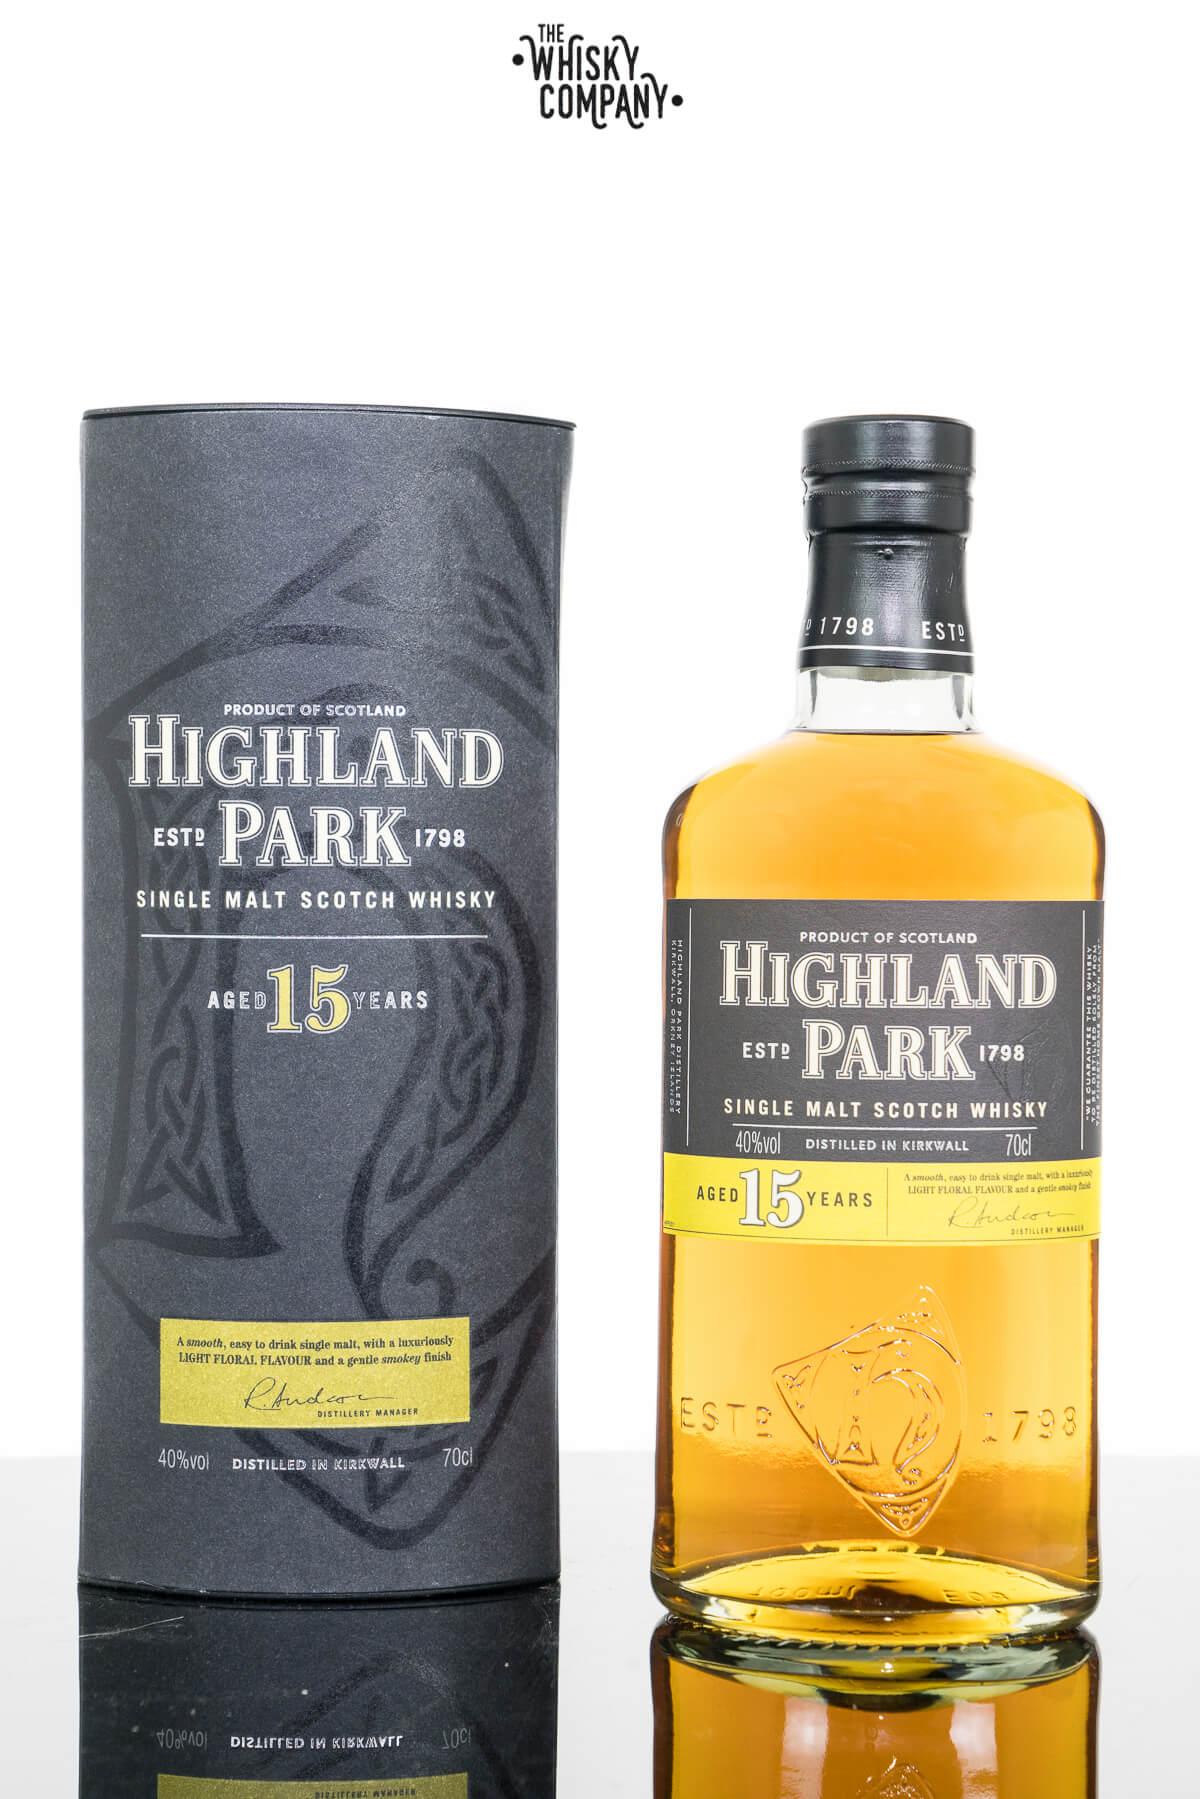 Highland Park Aged 15 Years Island Single Malt Scotch Whisky (700ml)